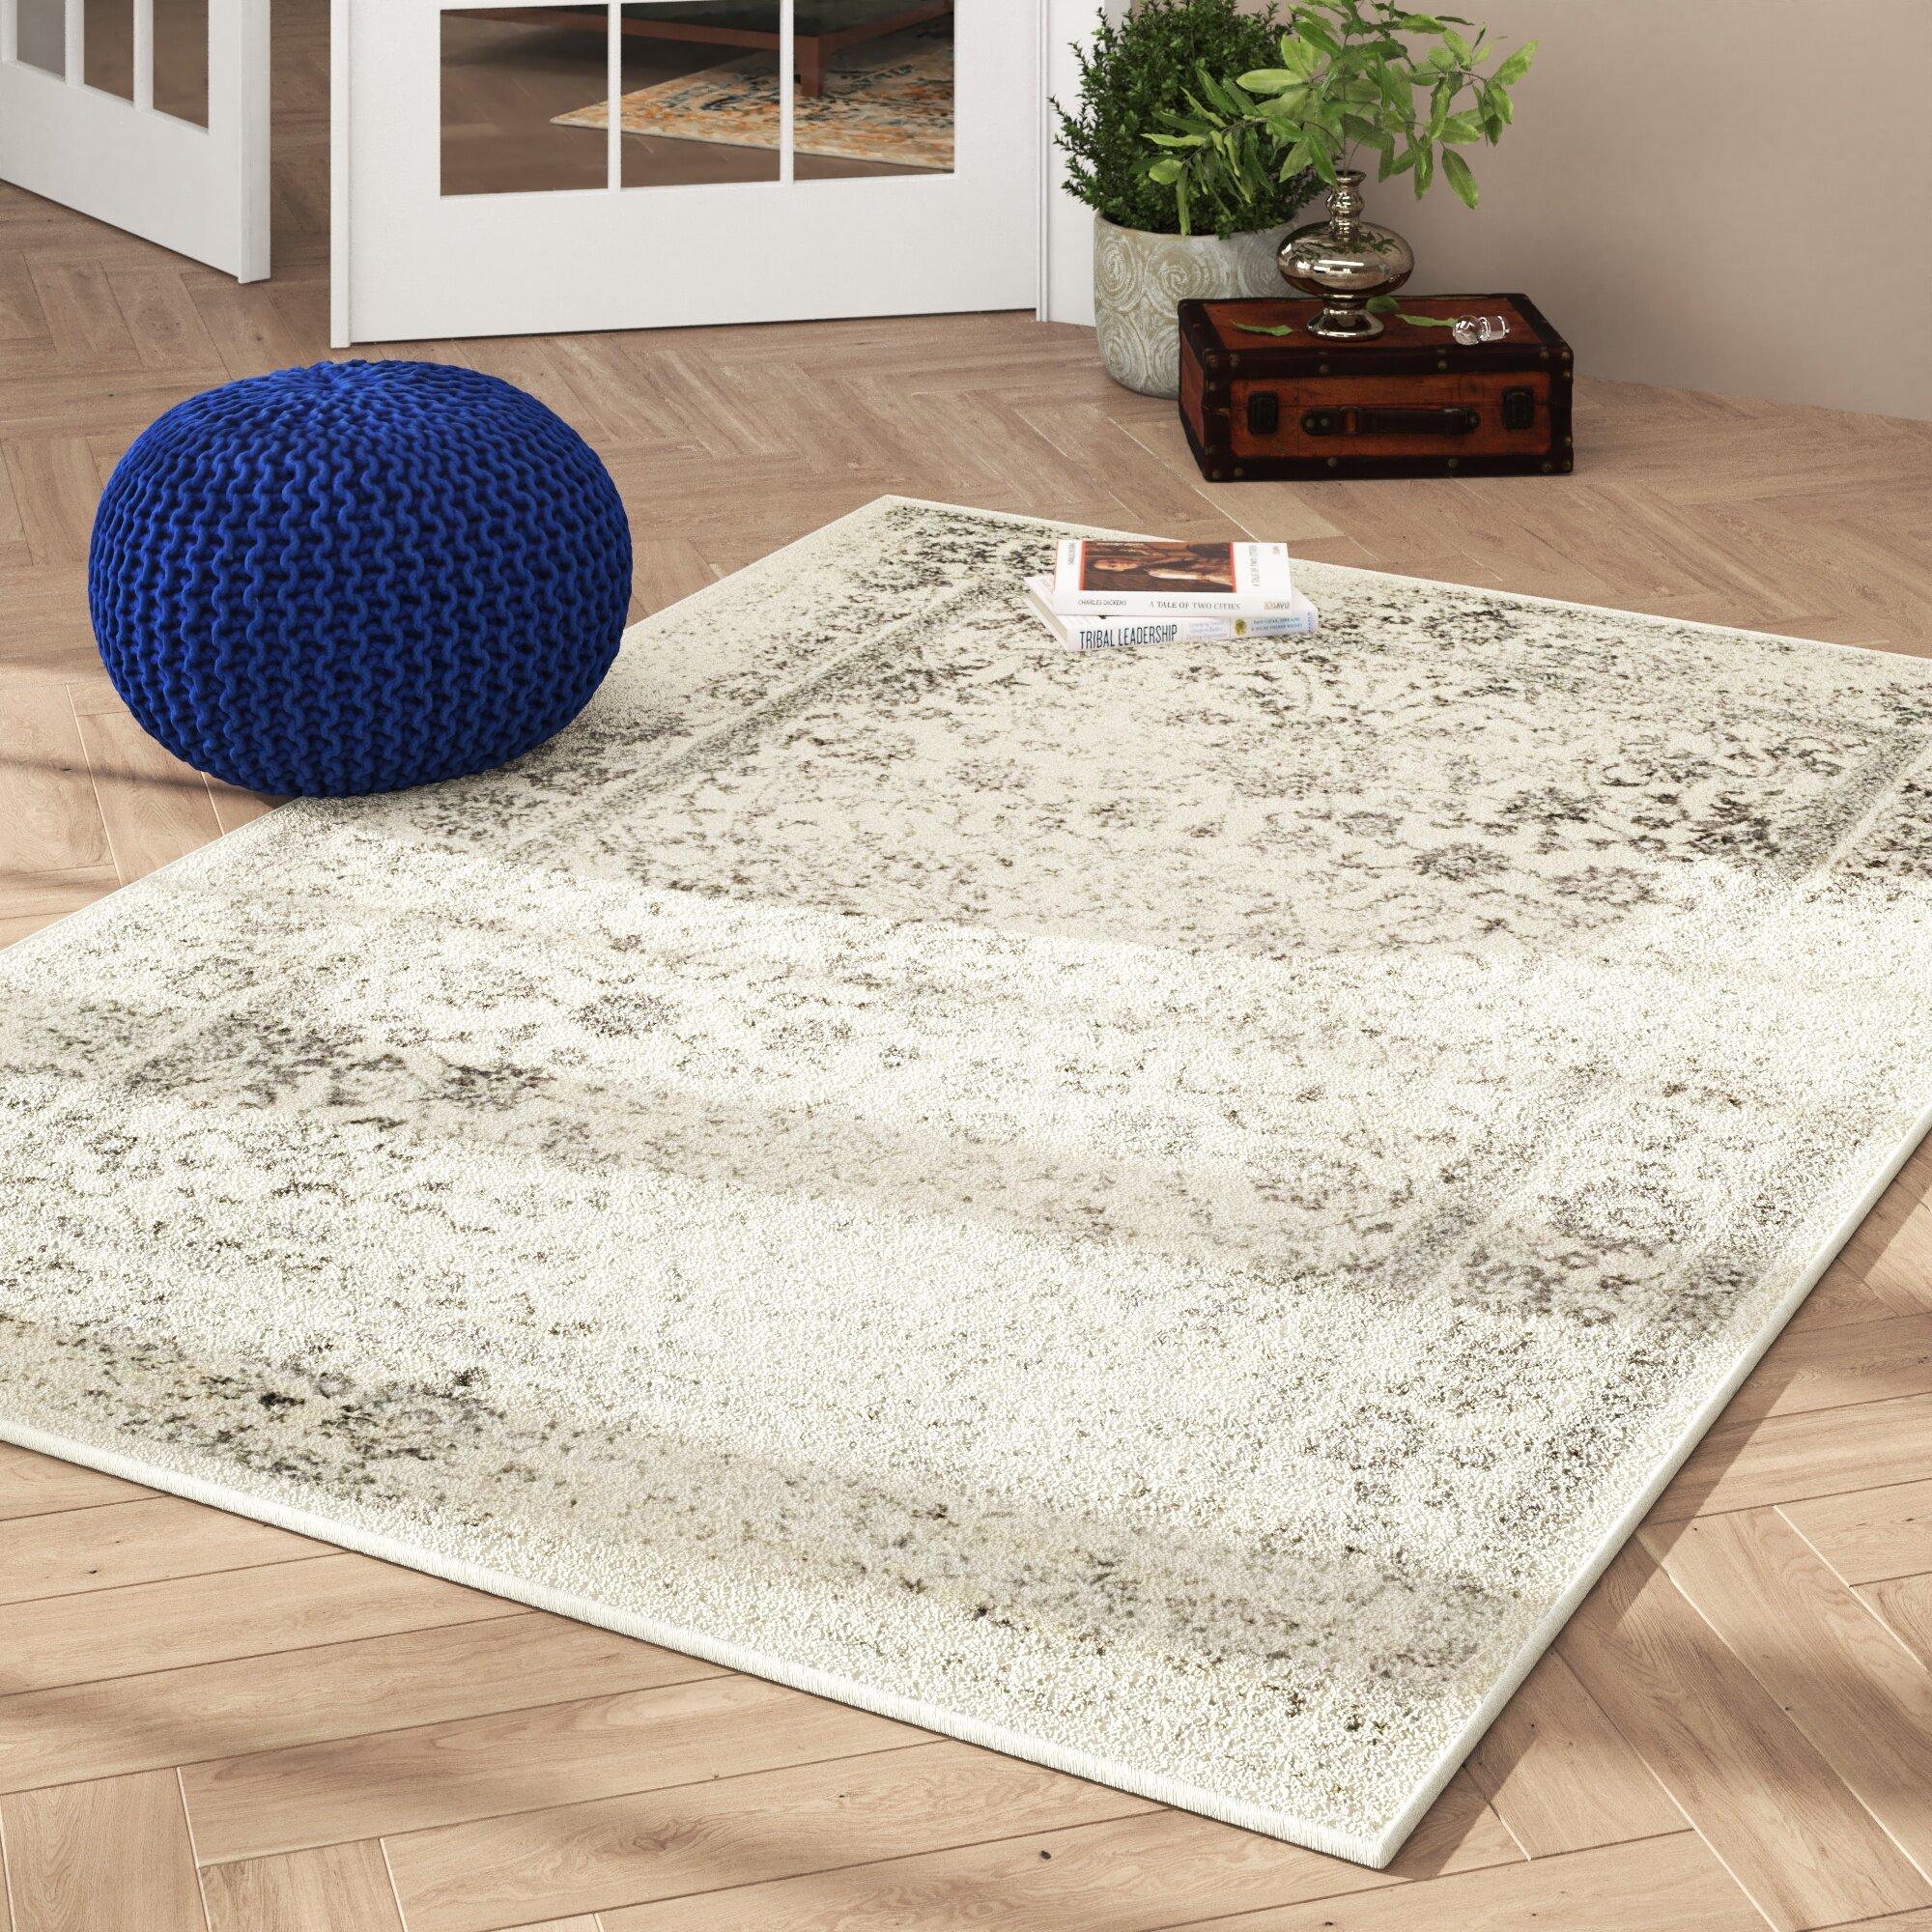 Rugs & Carpets sample available EURO FLOR Woven Vinyl Rug Silver 6 ...